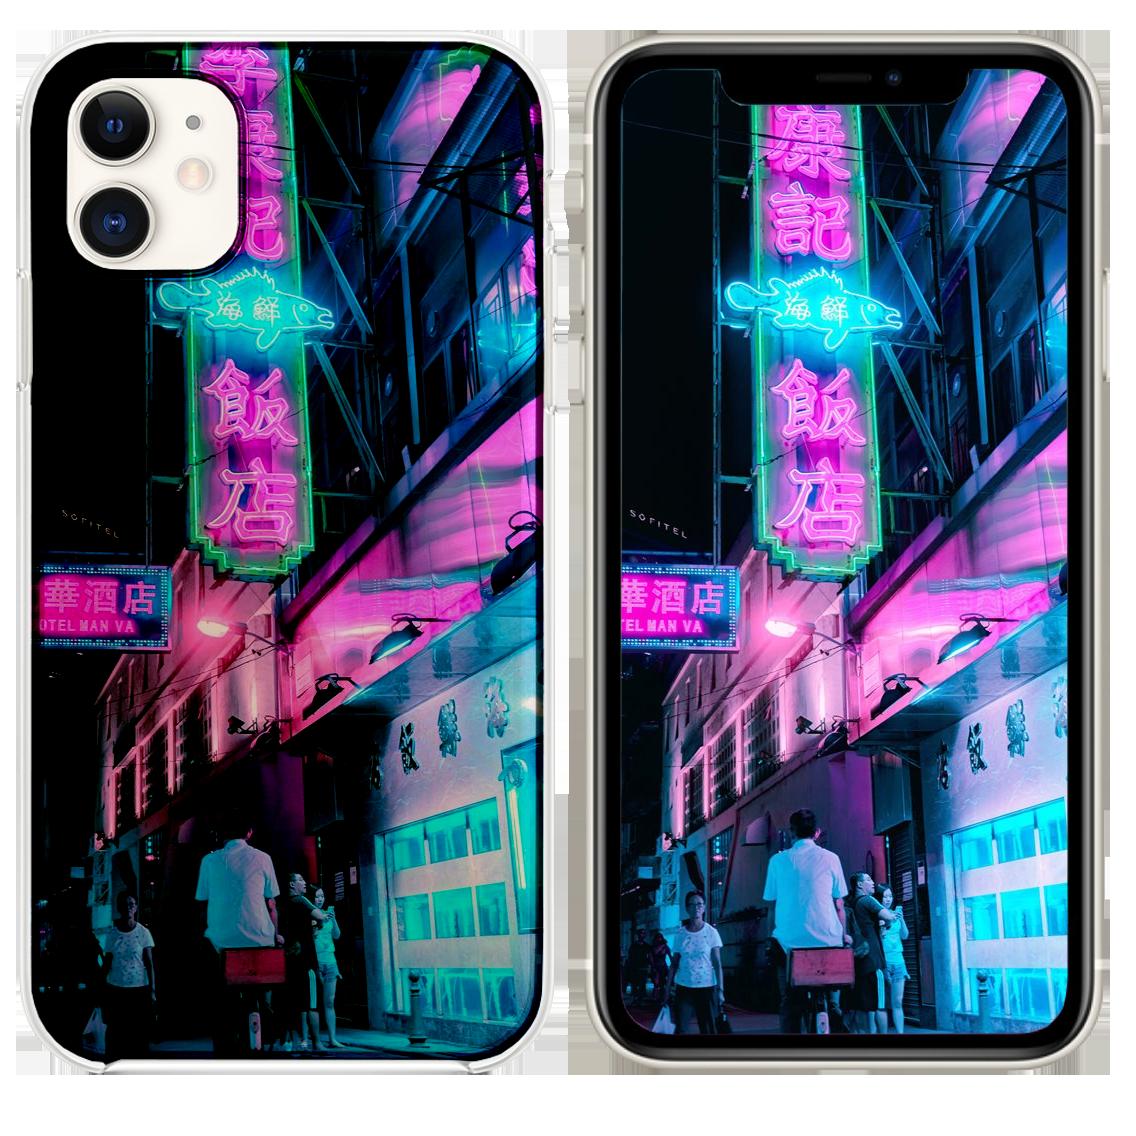 Macau Iphone 11 Case With Images Iphone 11 Iphone Case